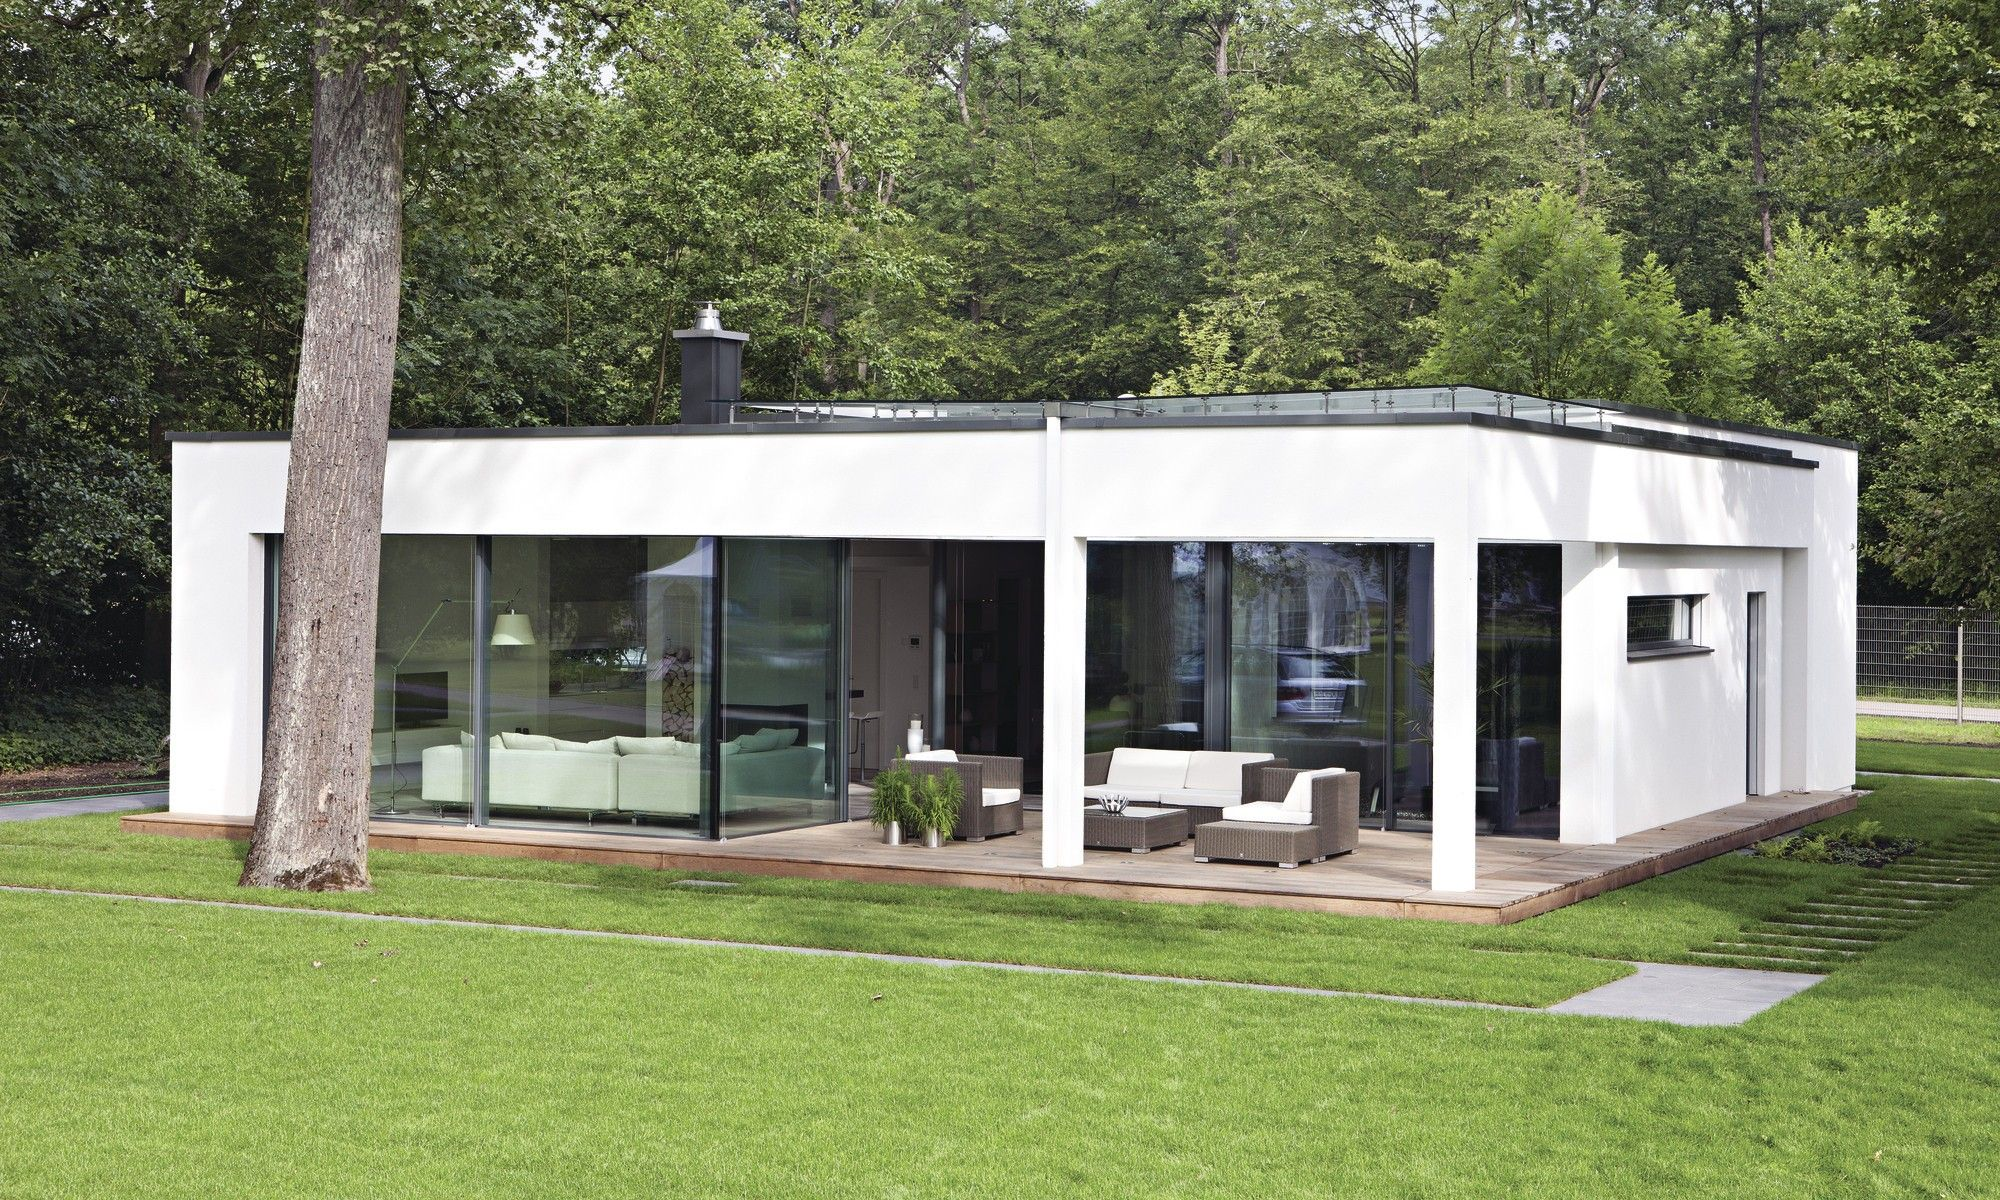 Neues haus front design hausdetailansicht  housedesert contemporary  pinterest  modern